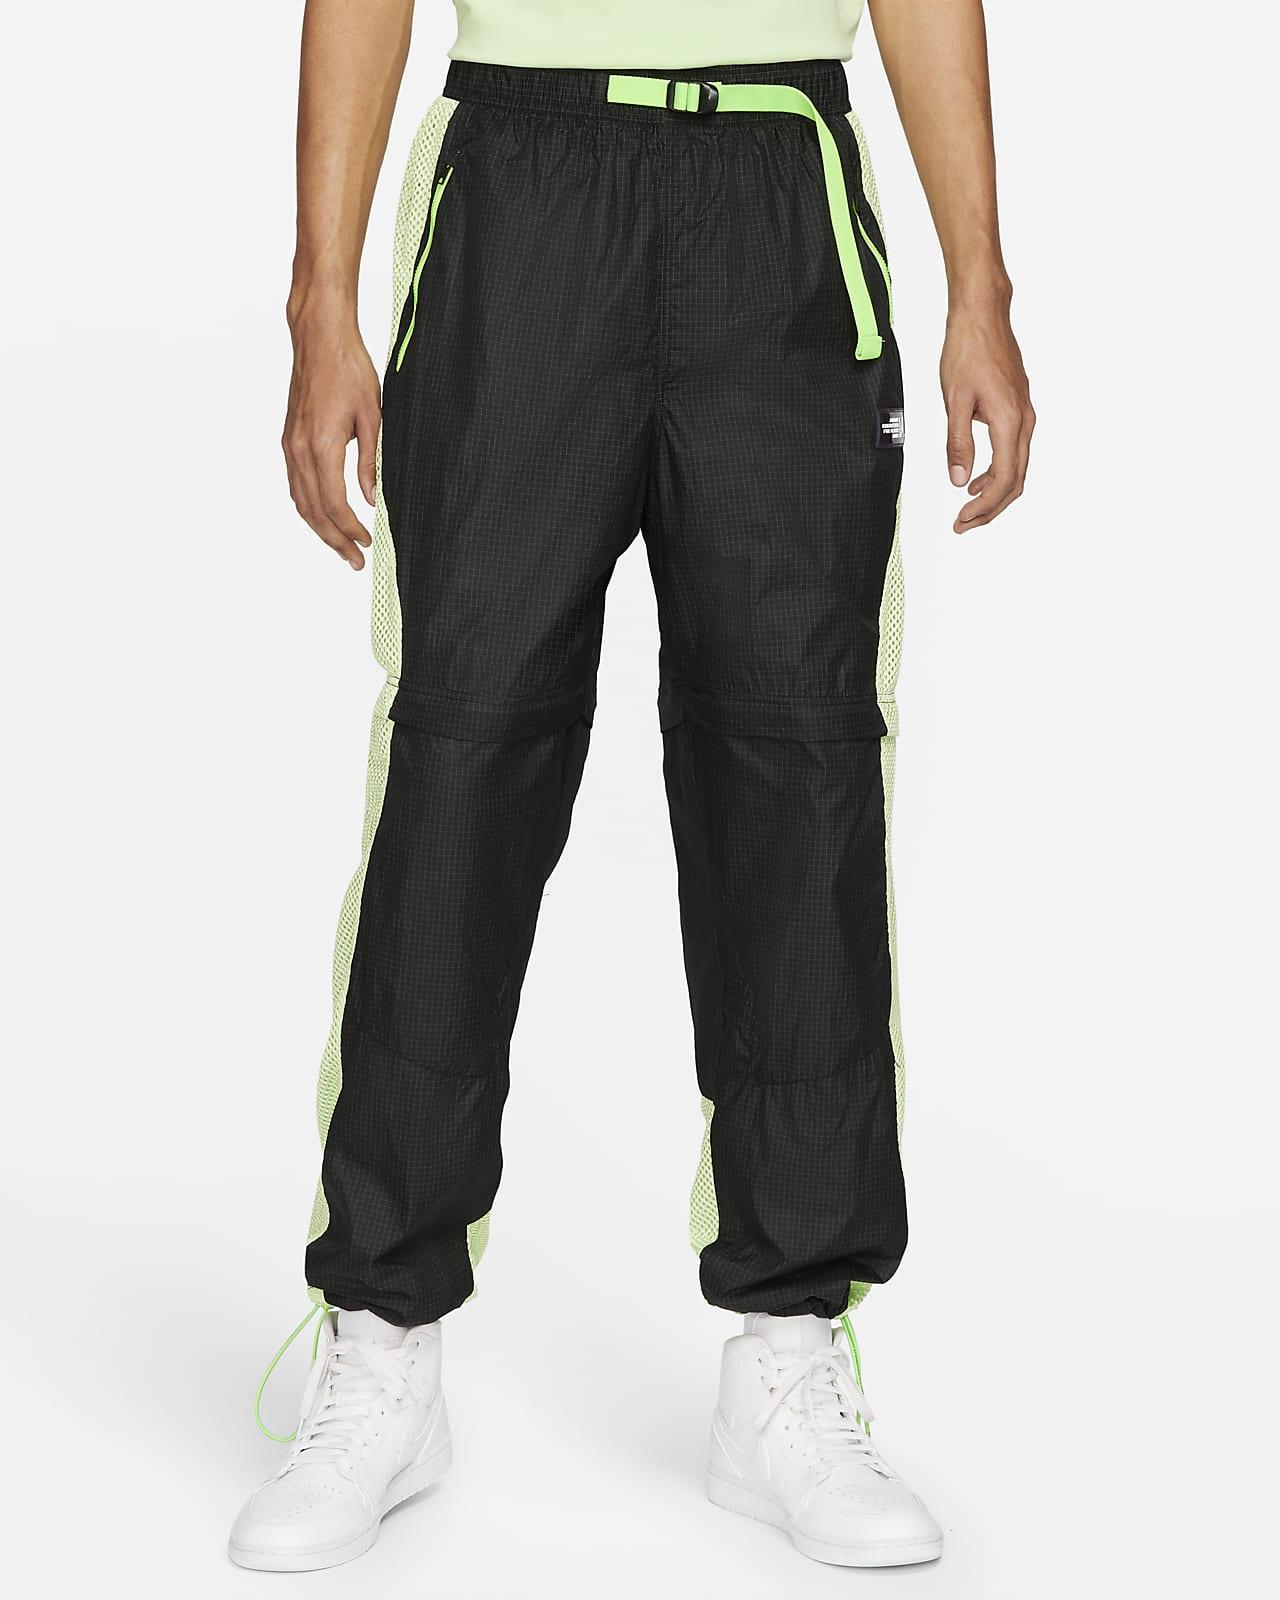 Jordan 23 Engineered Pantalons de xandall - Home